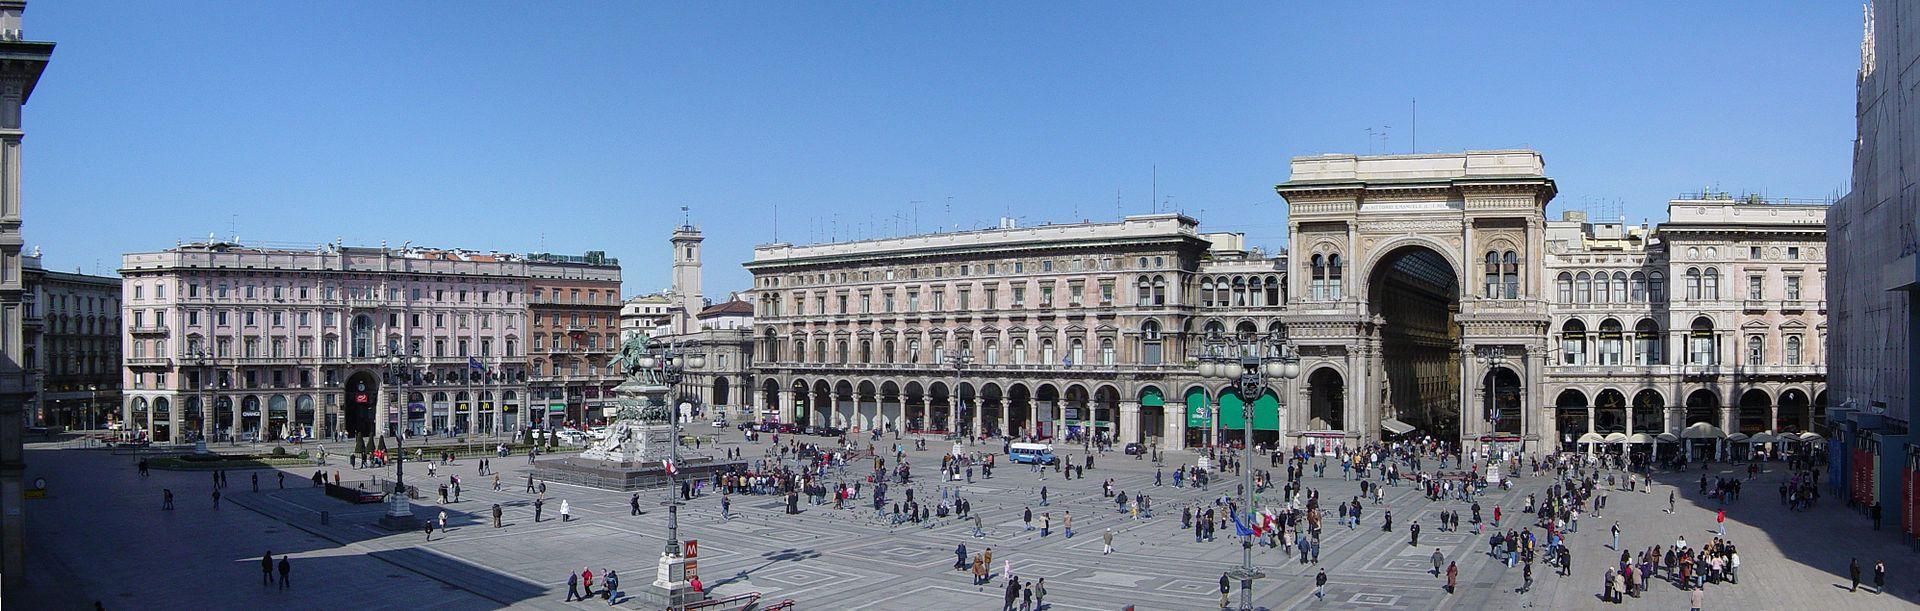 panoramica_plaza_duomo_milan